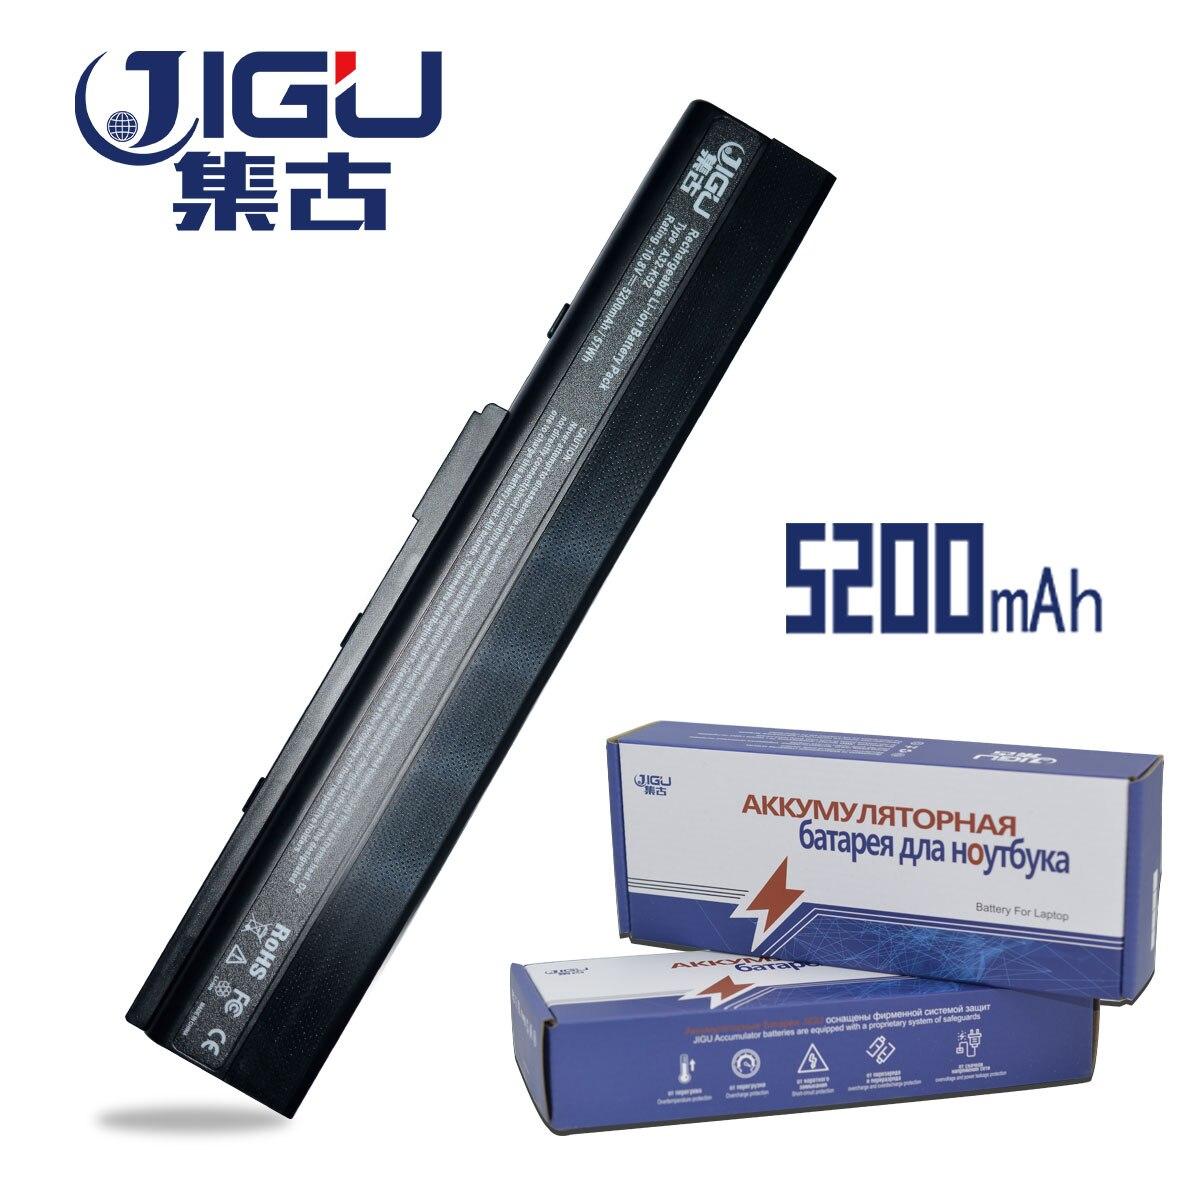 JIGU High Qualiy Laptop Battery For K52J K52JB K52JC K52JE K52JK K52JR K52N K52D K52DE K52DR K52F K62 K62F K62J K62JR N82